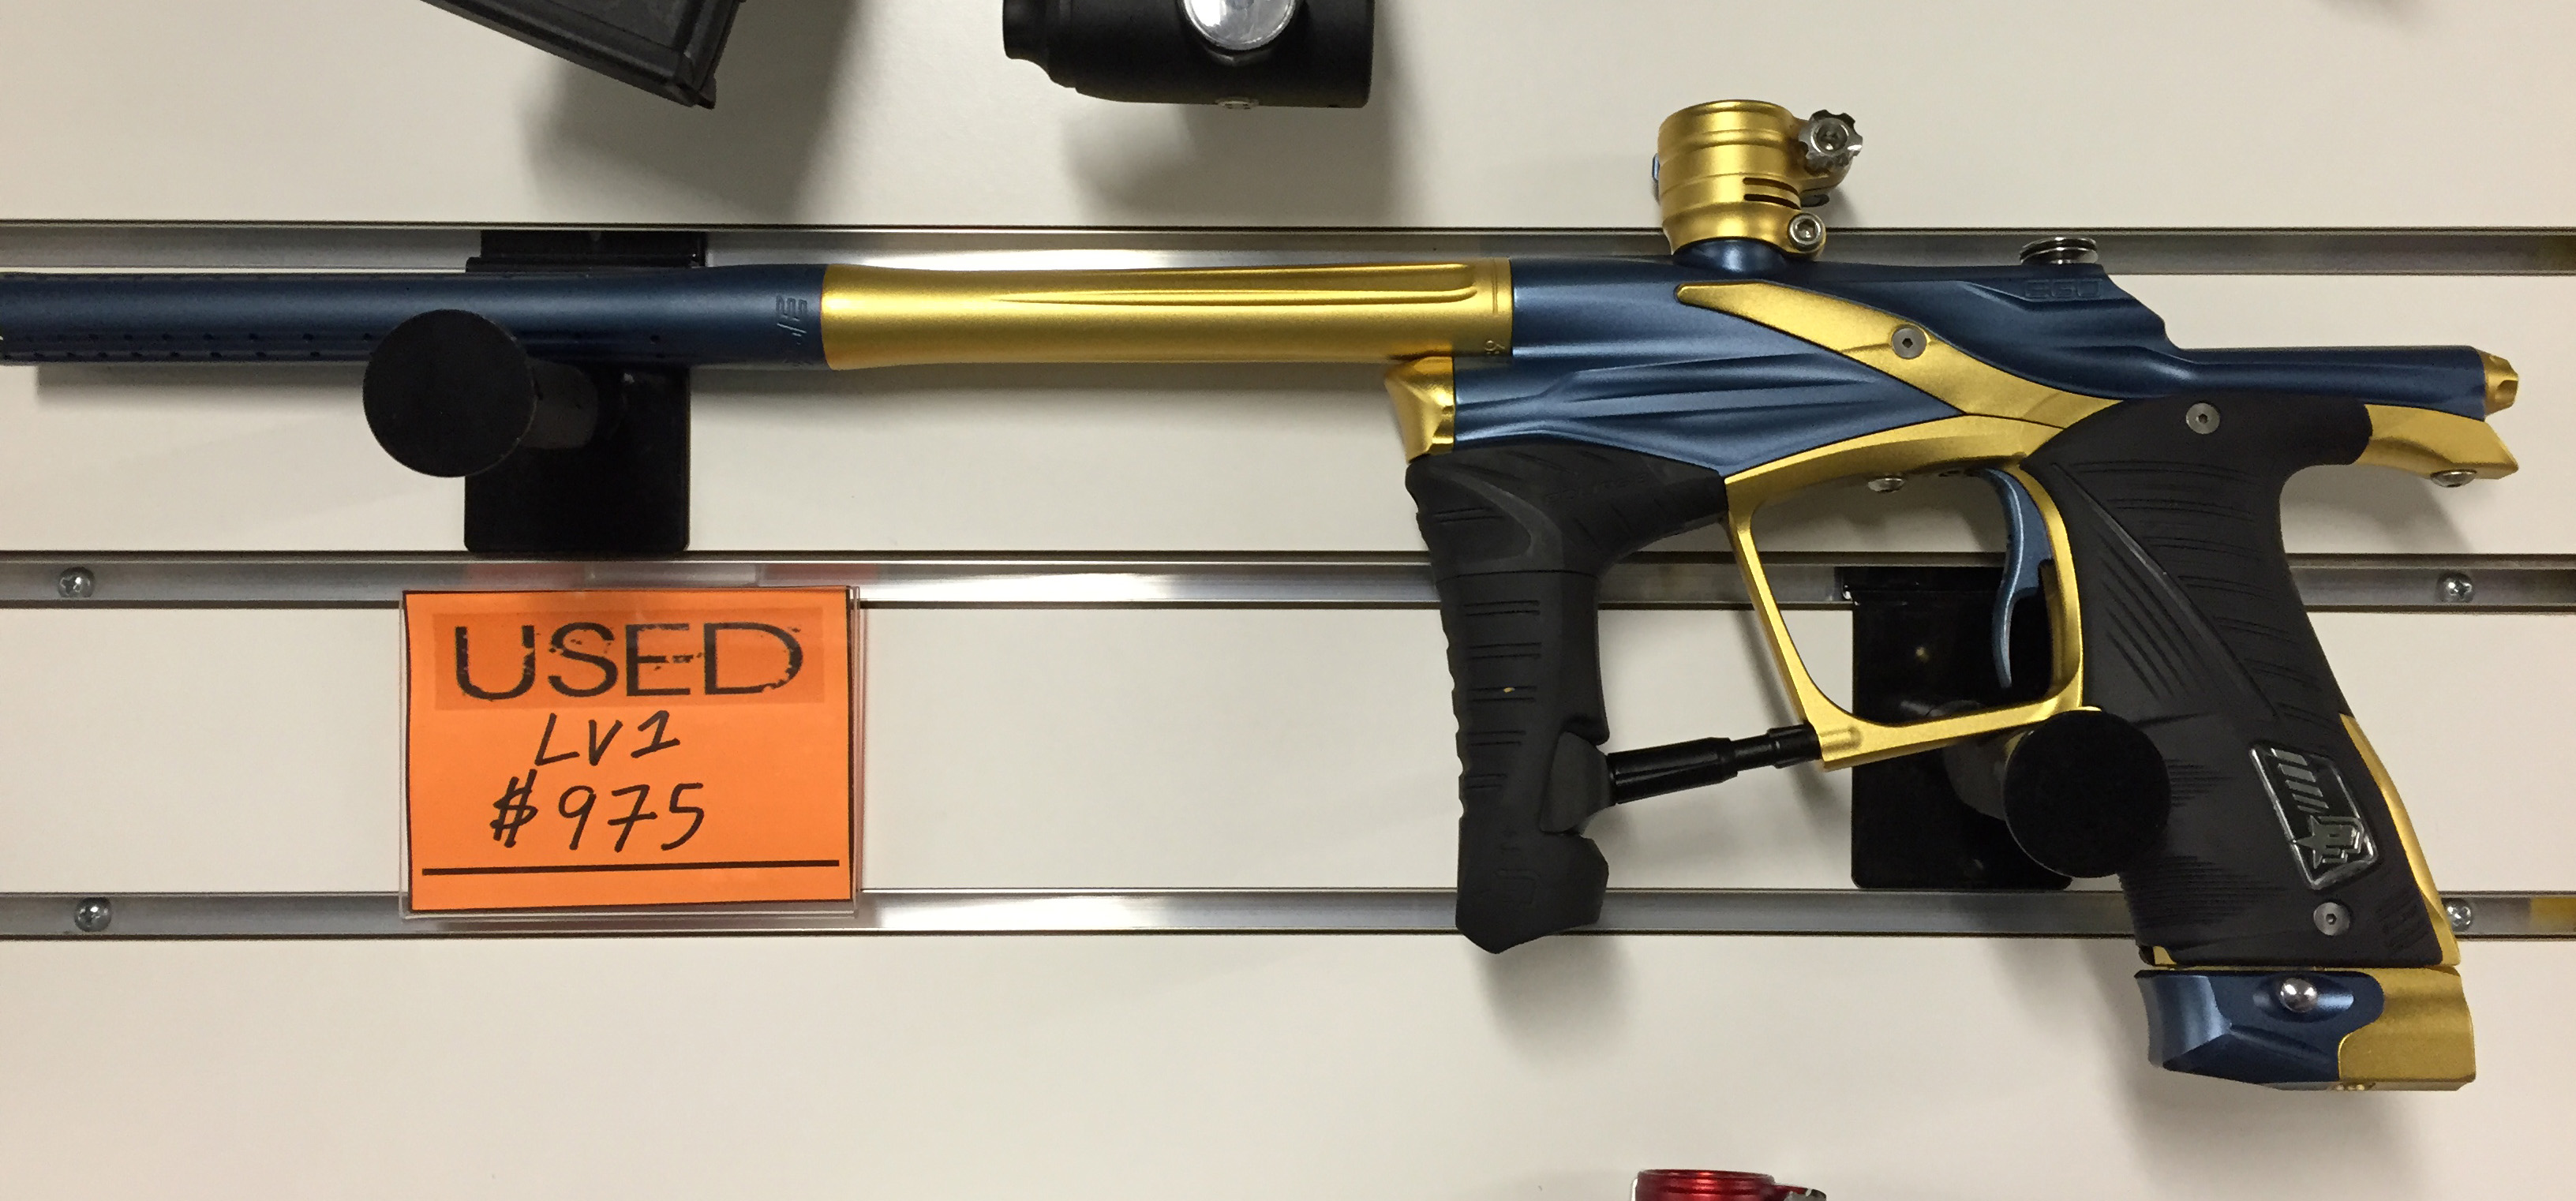 Gold/Navy LV1 $975